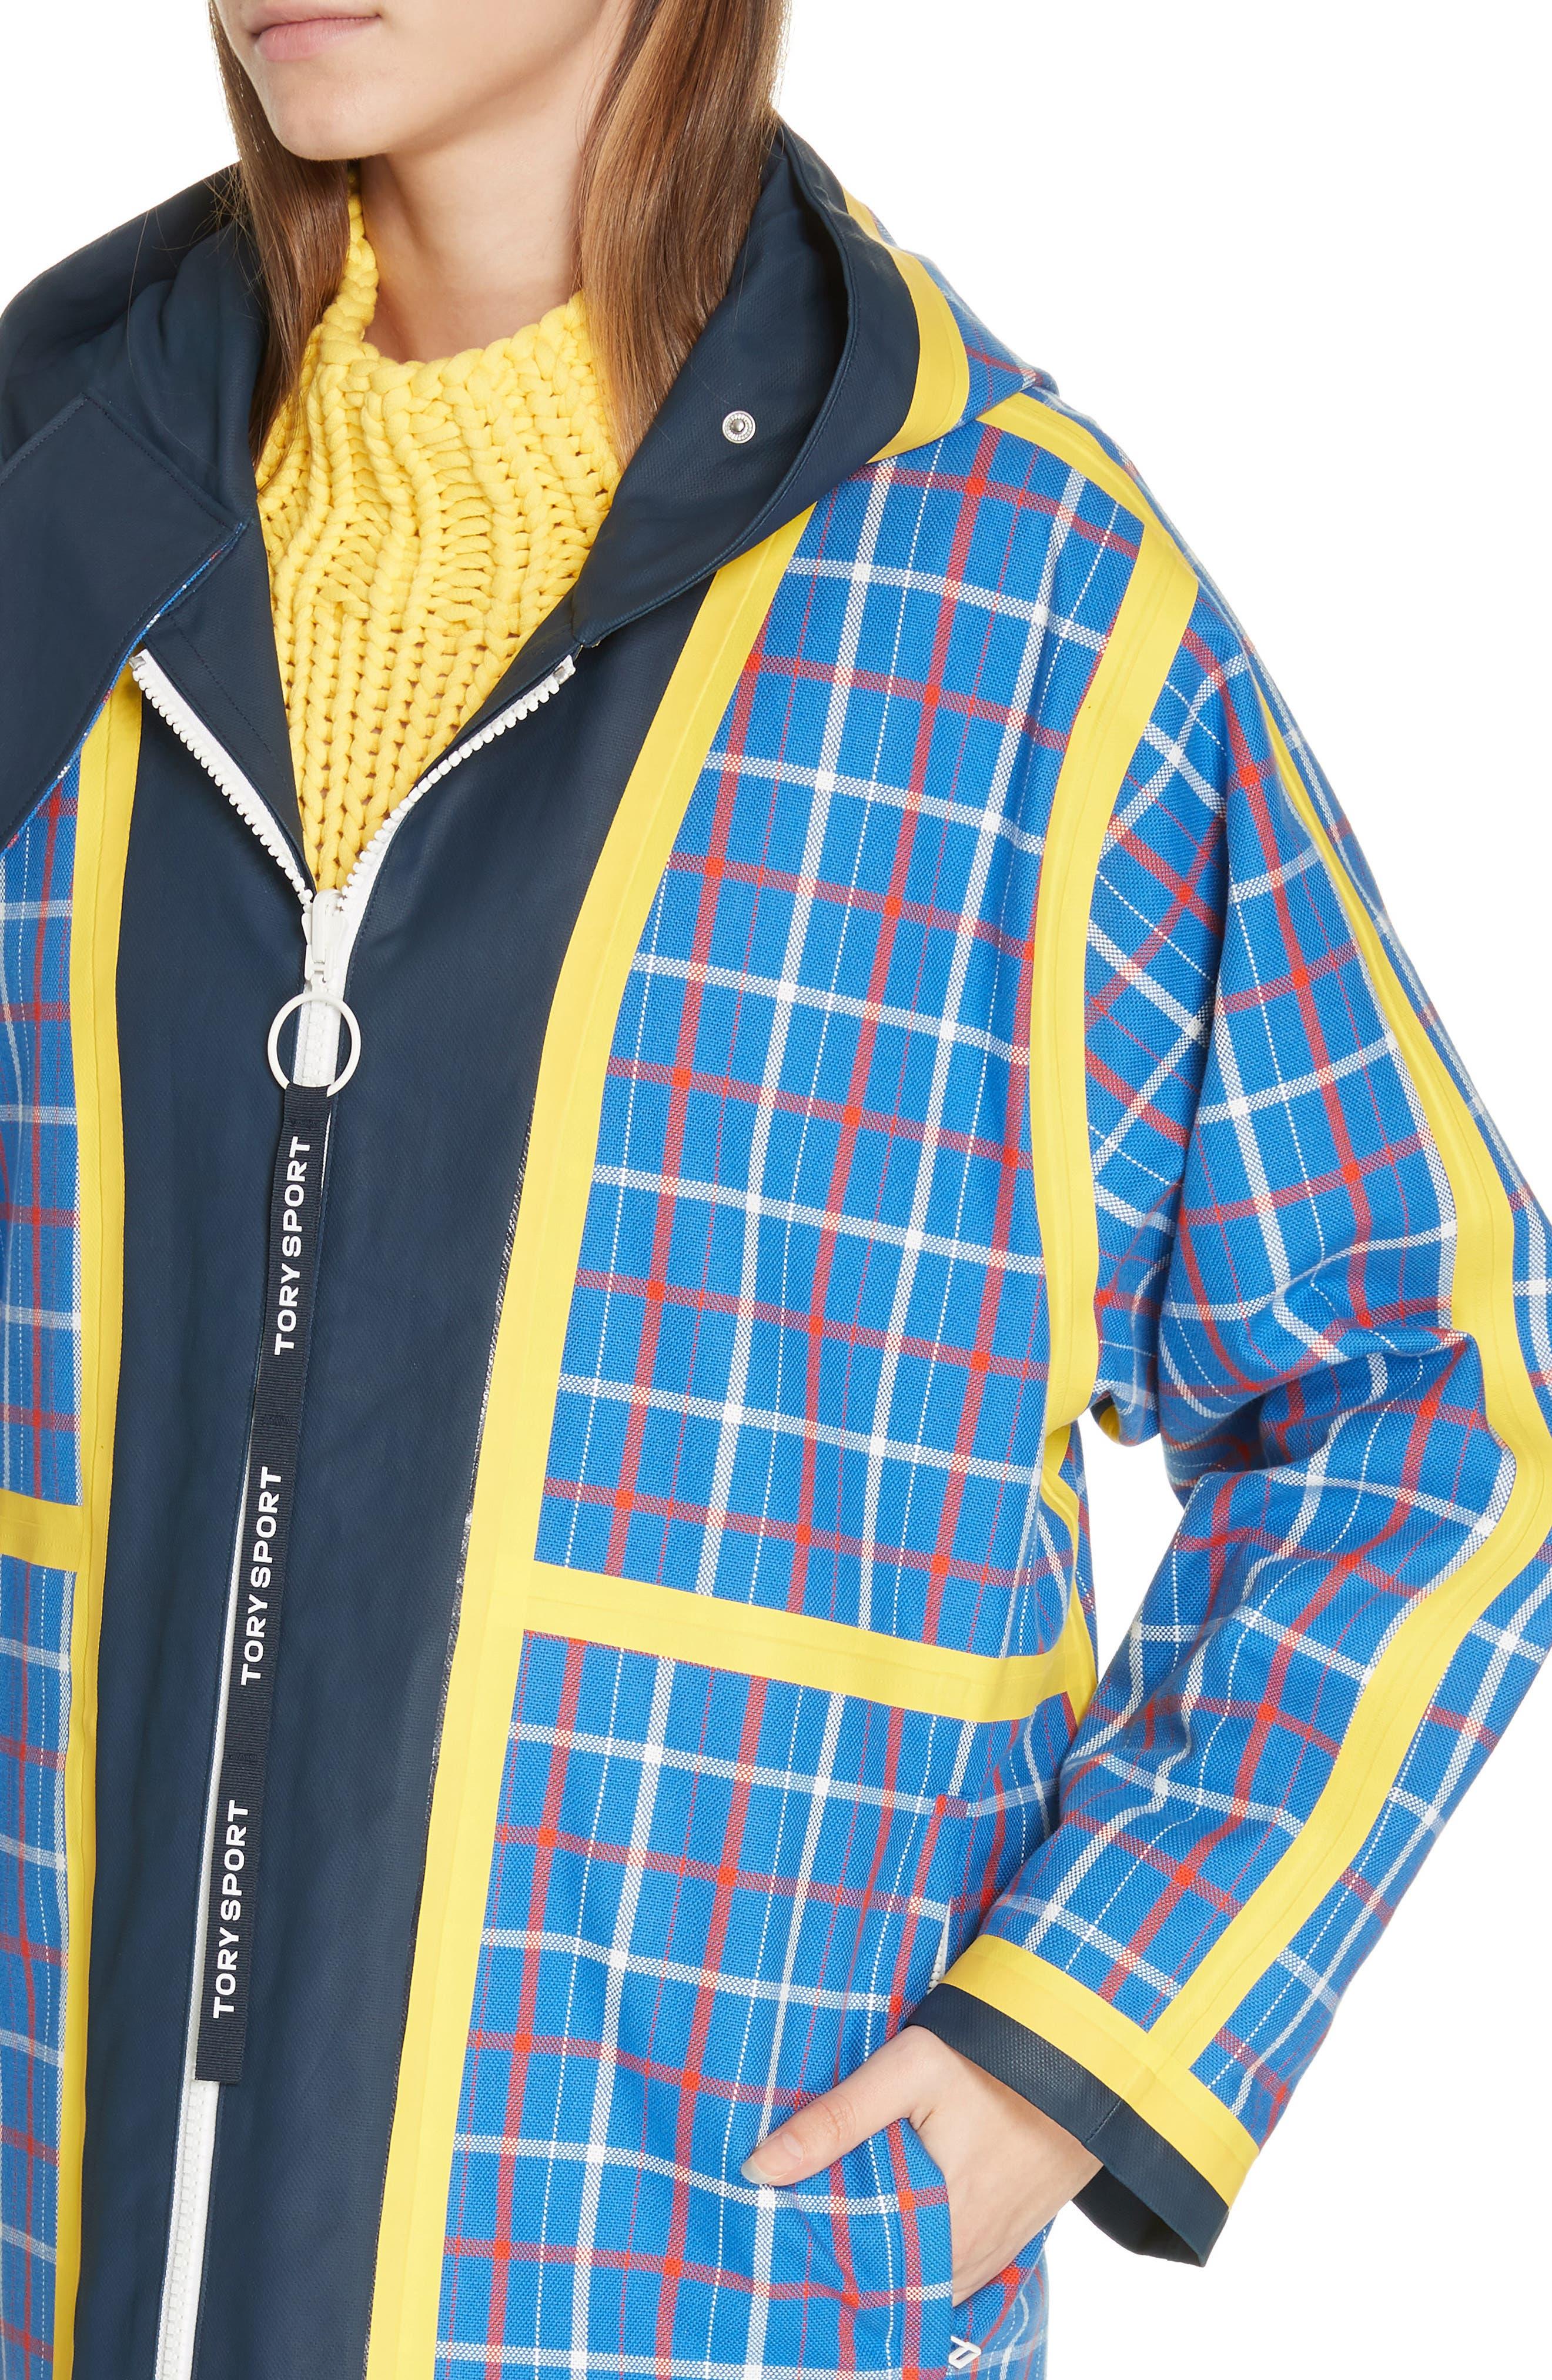 TORY SPORT, Reversible Coated Canvas Rain Coat, Alternate thumbnail 6, color, TANDEM PLAID LARGE SURF BLUE